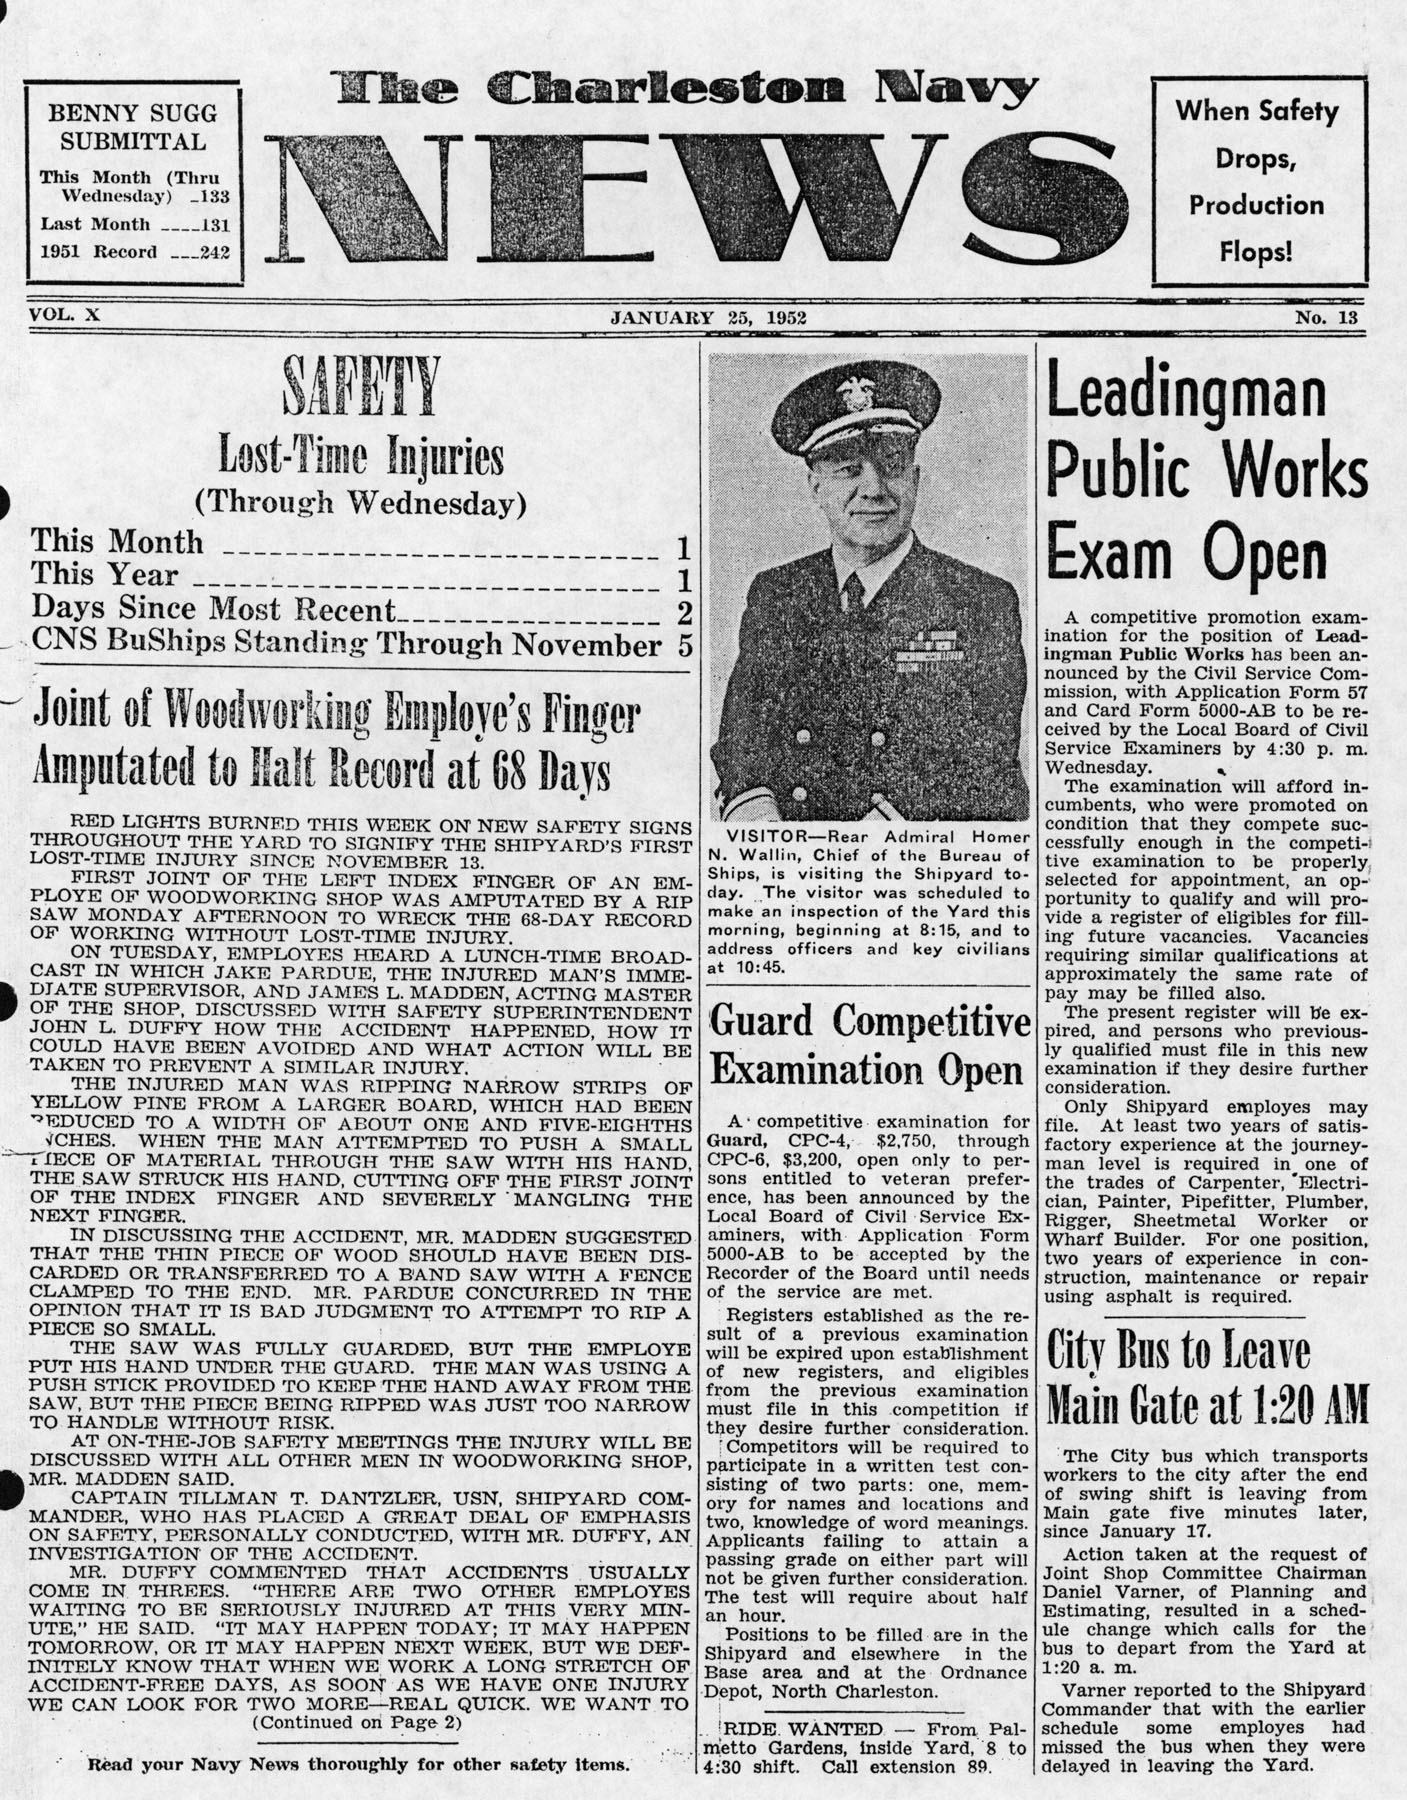 The Charleston Navy News, Volume 10, Edition 13, page i